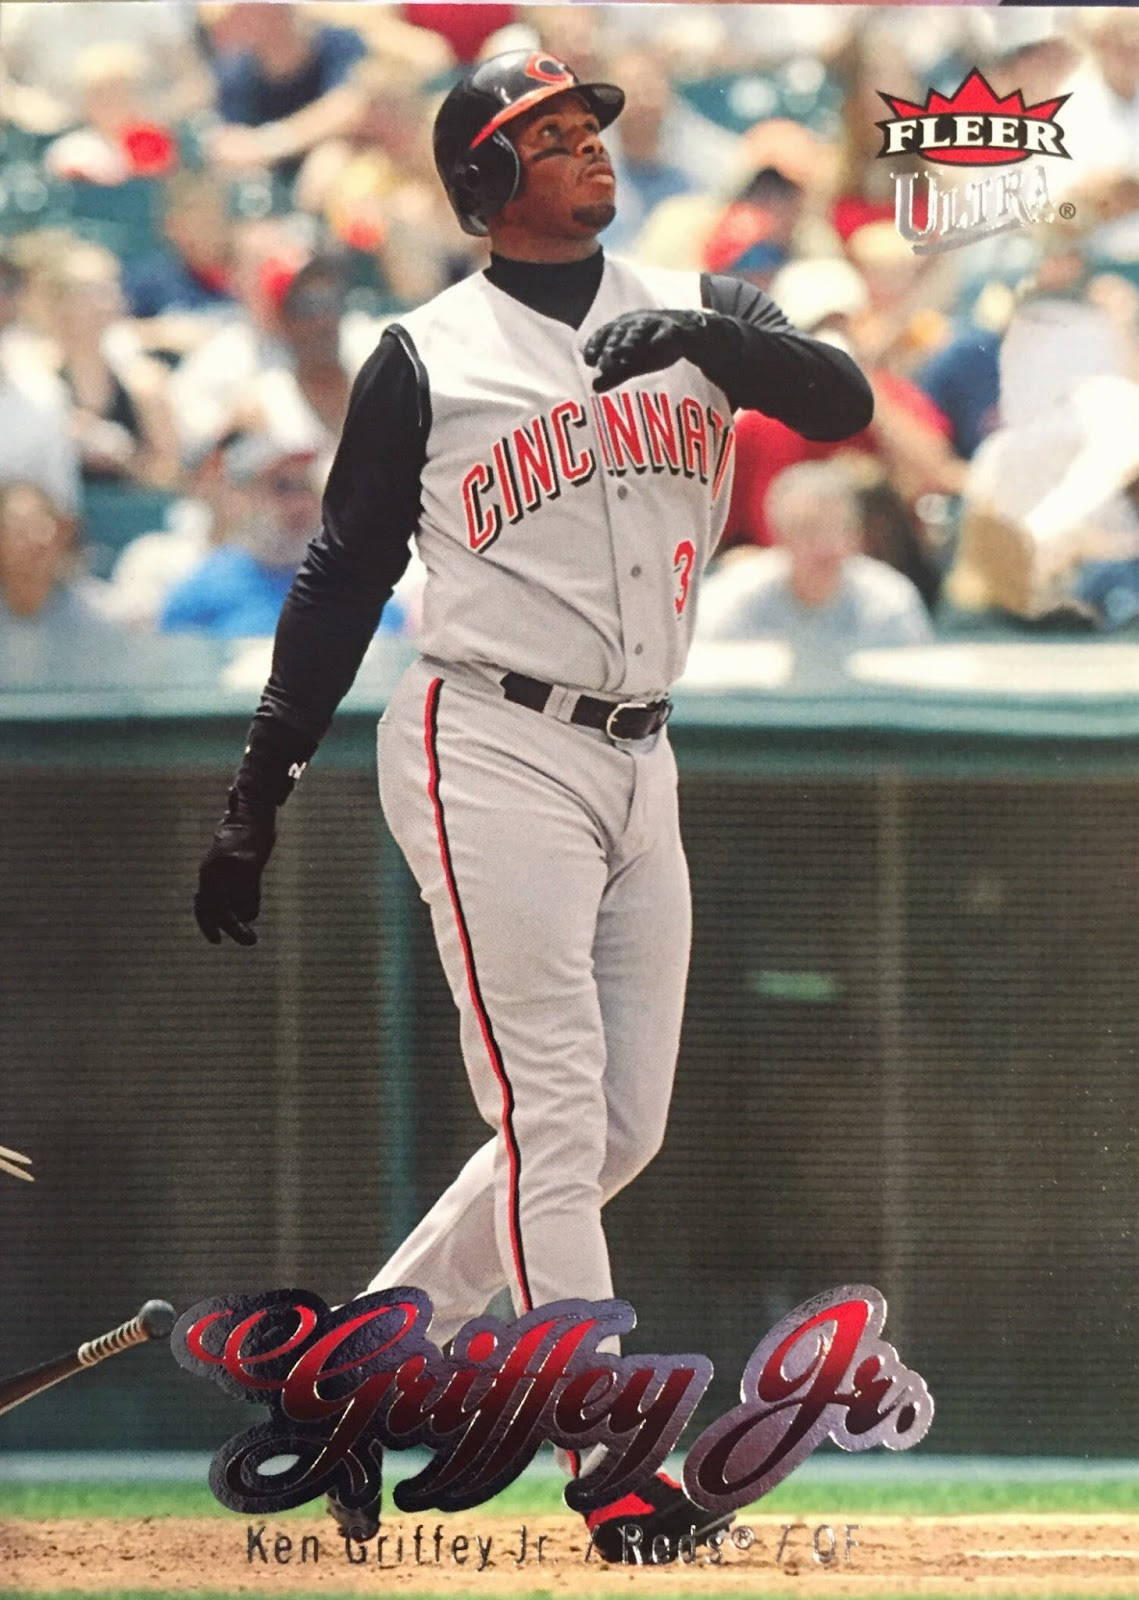 Ken griffey jr autographed photo Seattle Mariners MLB Original Autographed Photos eBay